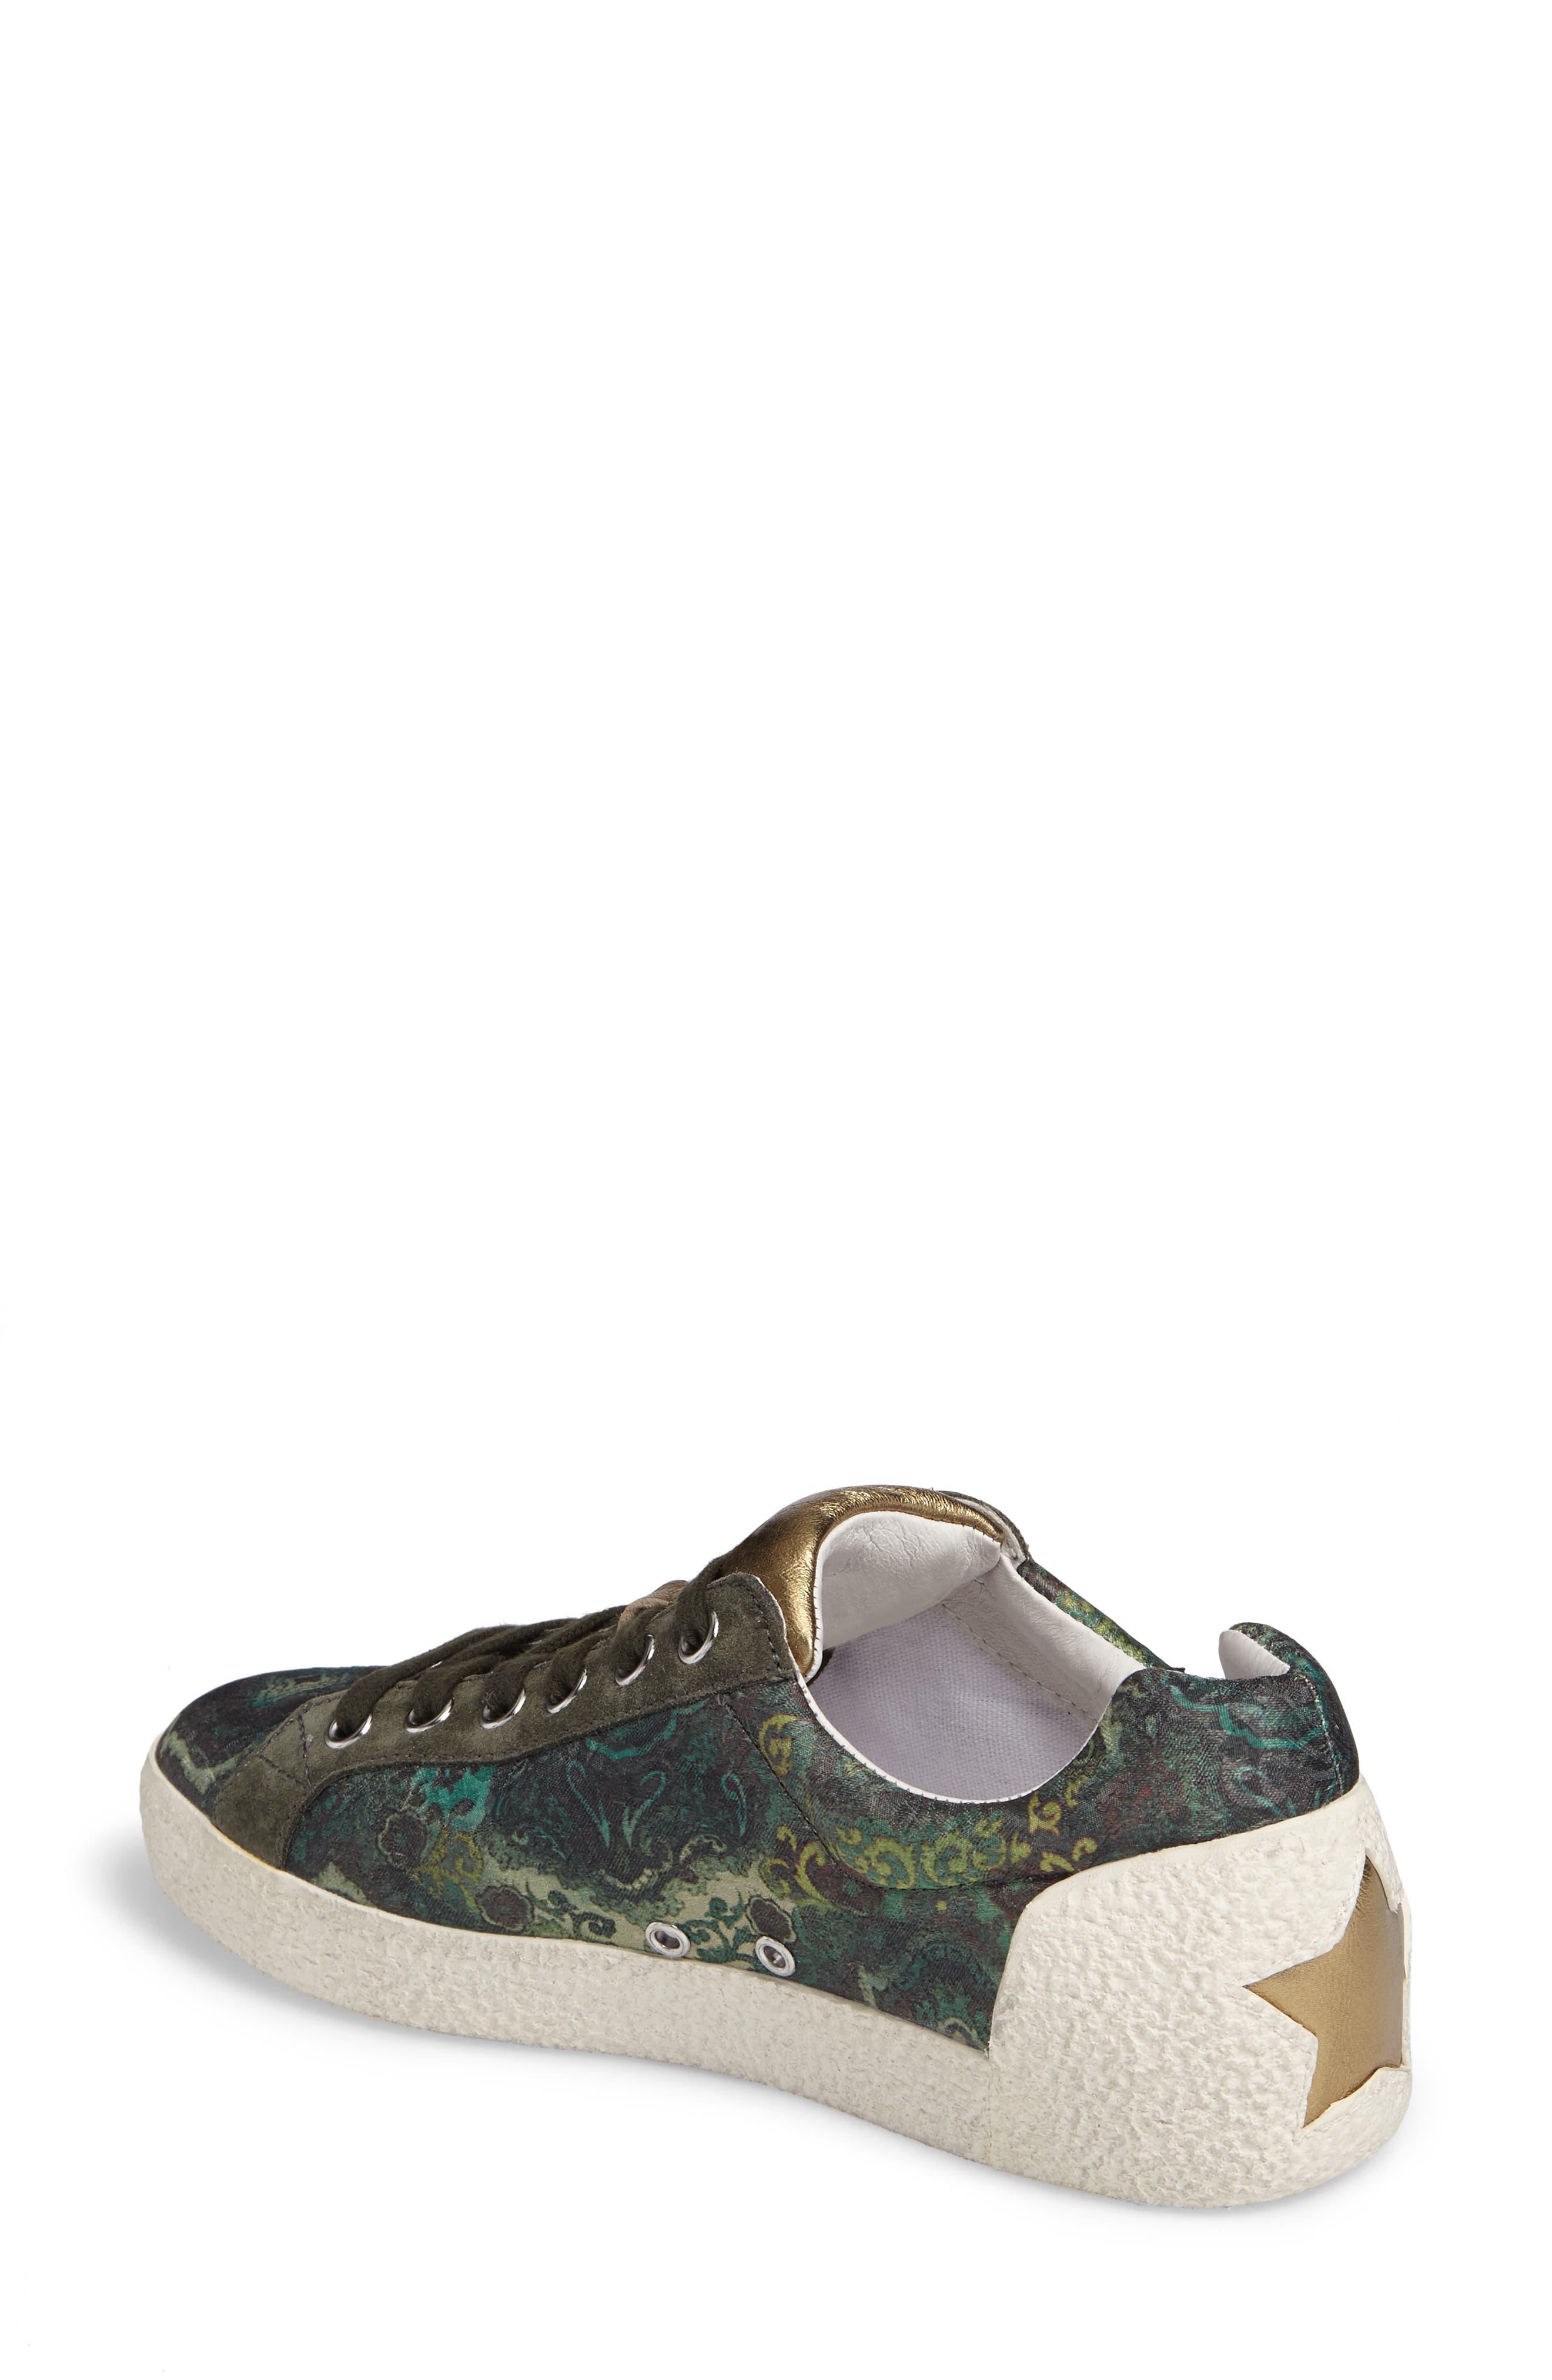 Alternate Image 2  - Ash Embellished Low-Top Sneaker (Women)